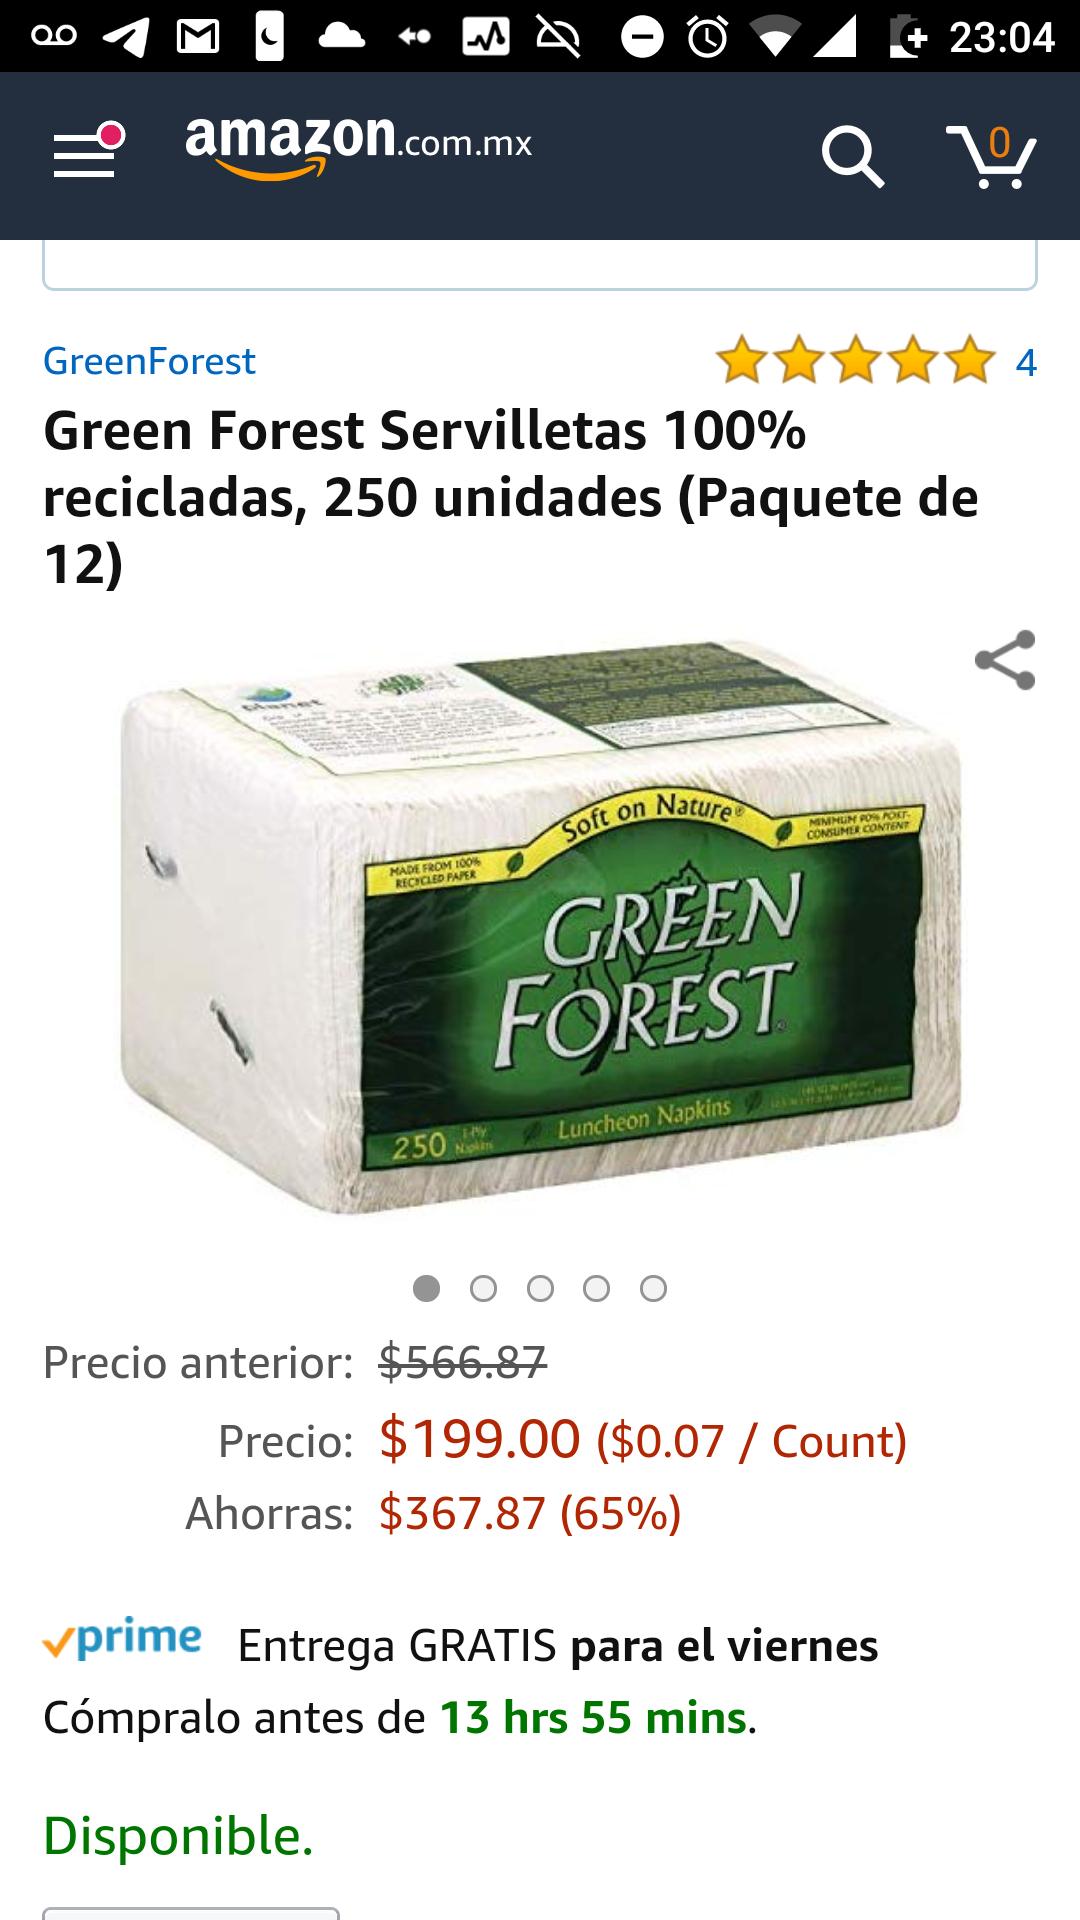 Amazon: 3,000 servilletas por $199